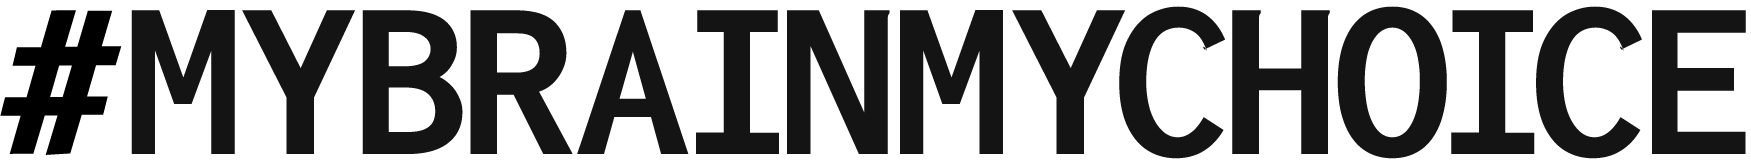 Logo mybrainmychoice